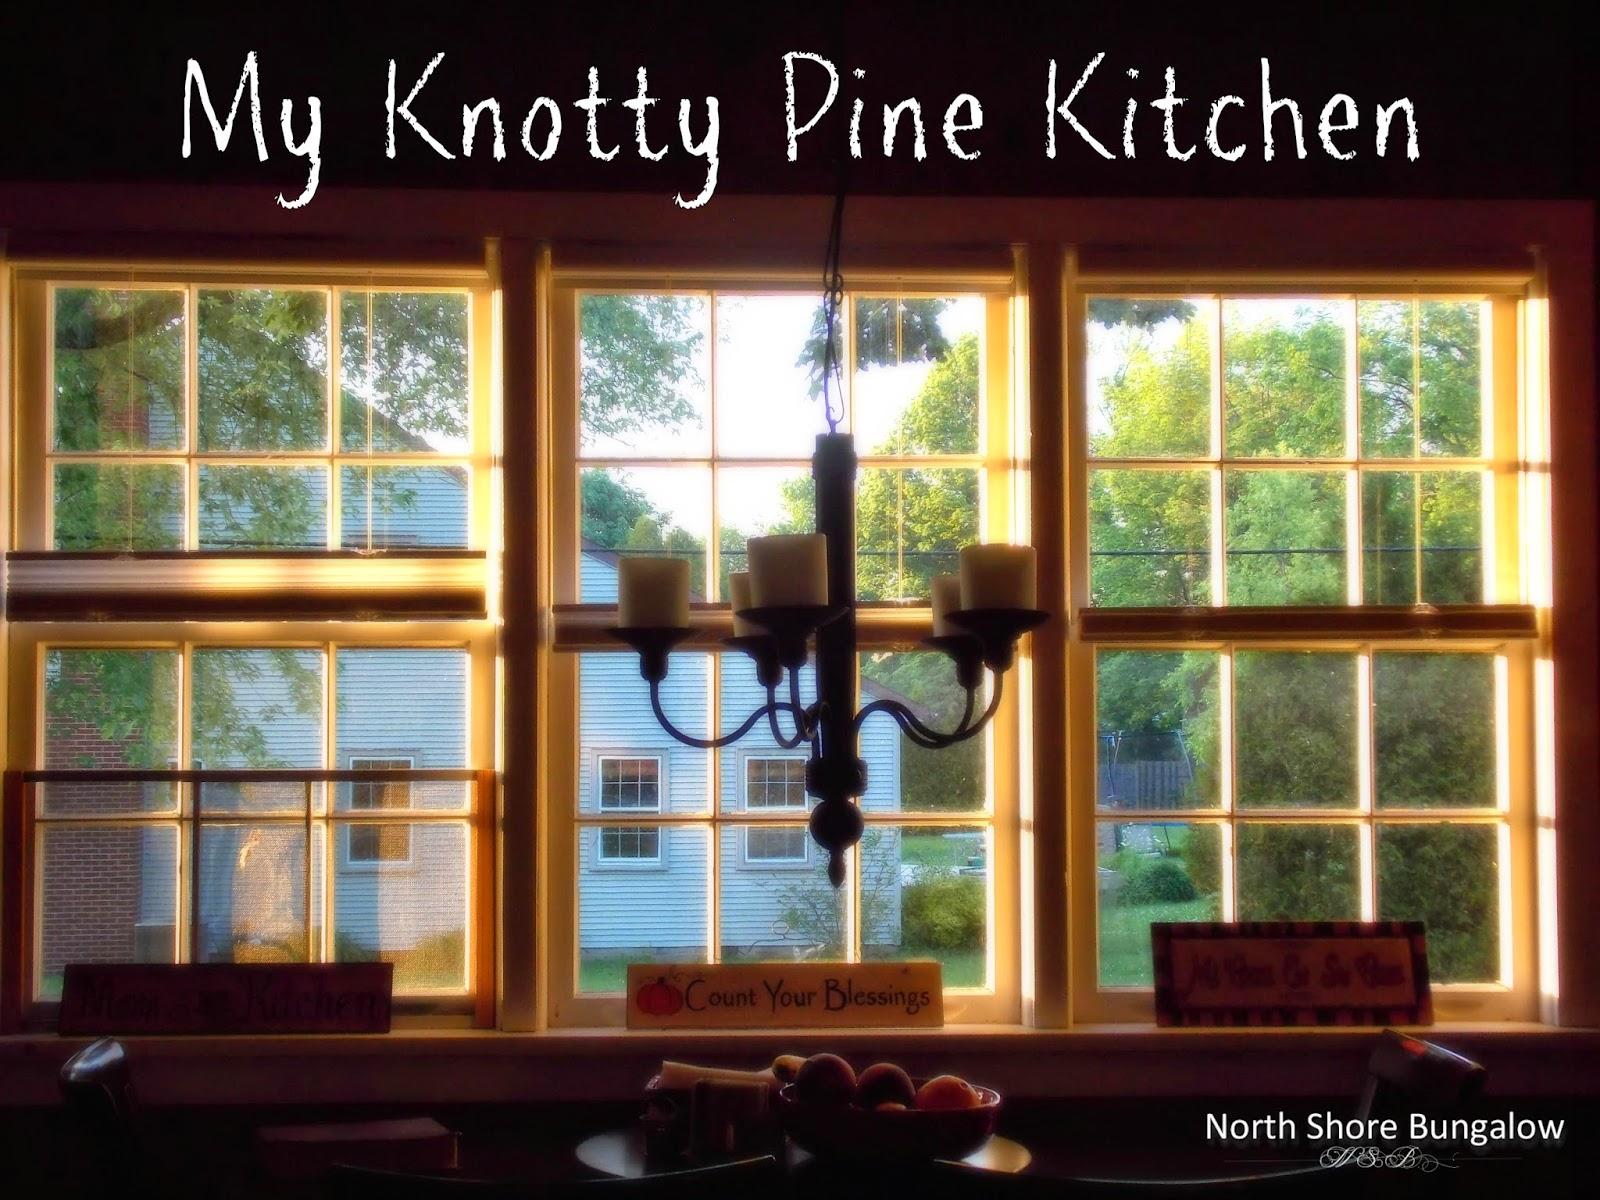 http://northshorebungalow.blogspot.com/2014/06/my-knotty-pine-kitchen.html